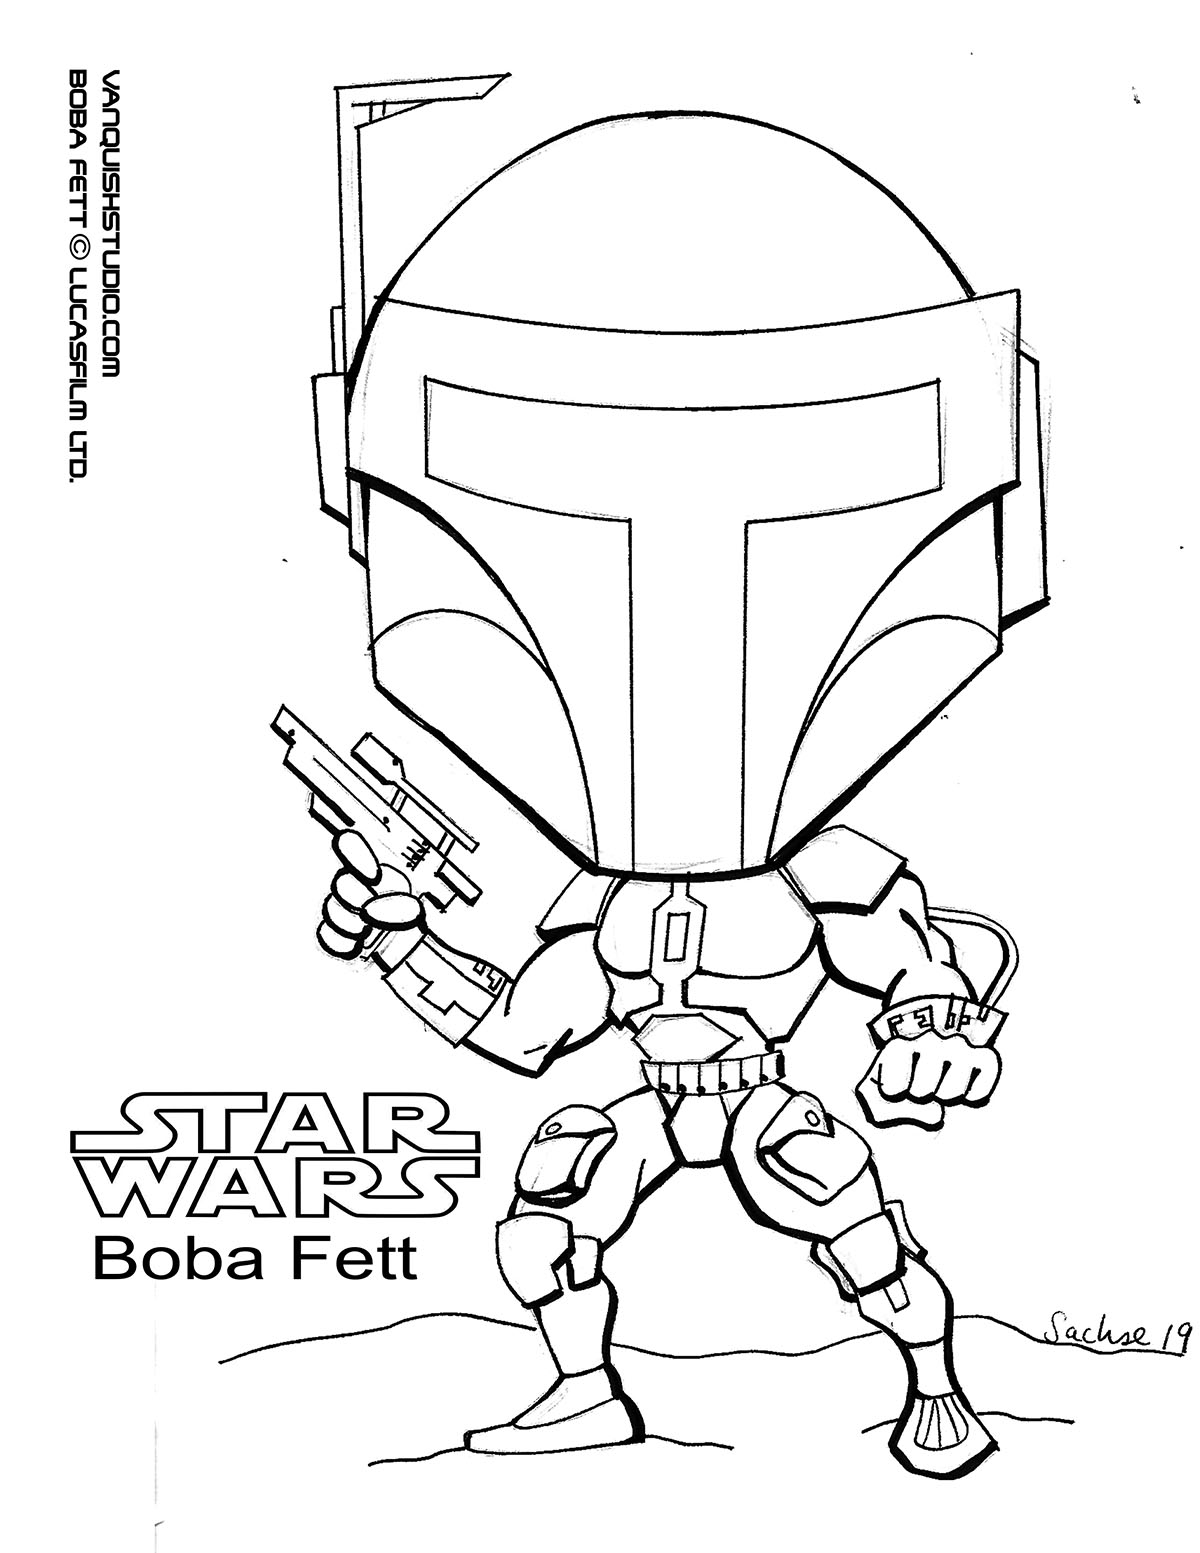 Boba Fett Coloring Page : coloring, Coloring, Vanquish, Studio